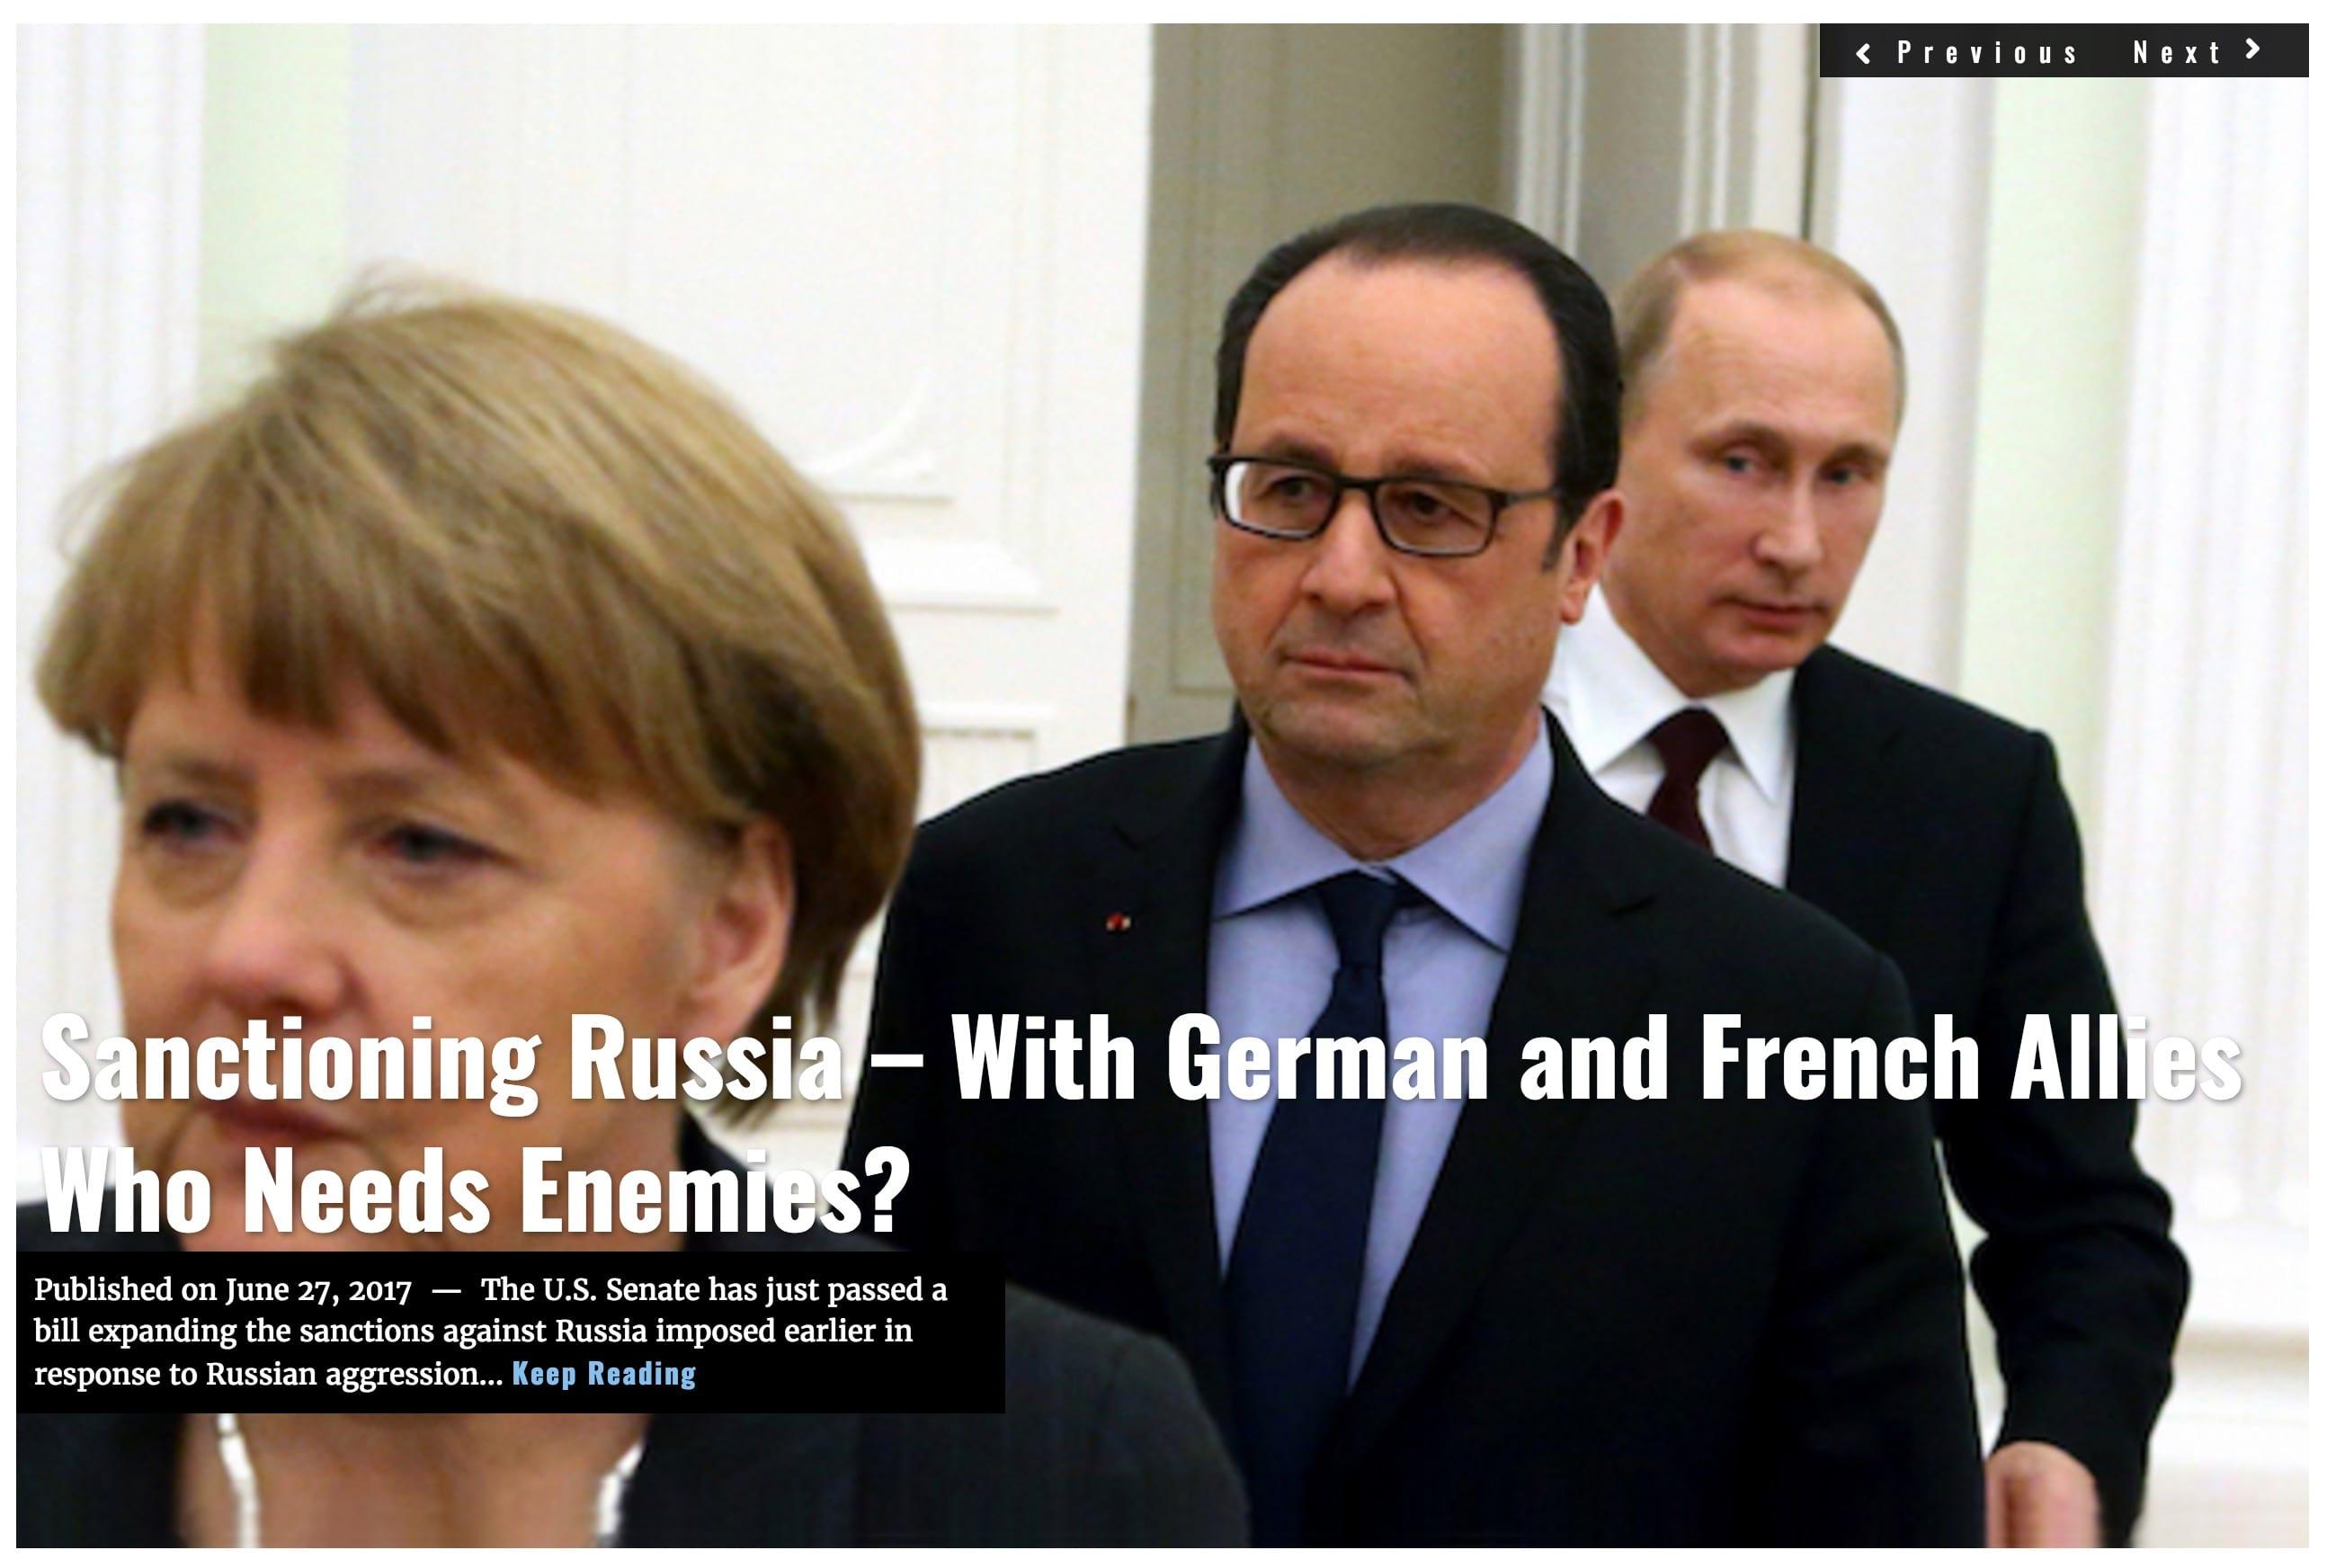 Image Lima Charlie News Headline